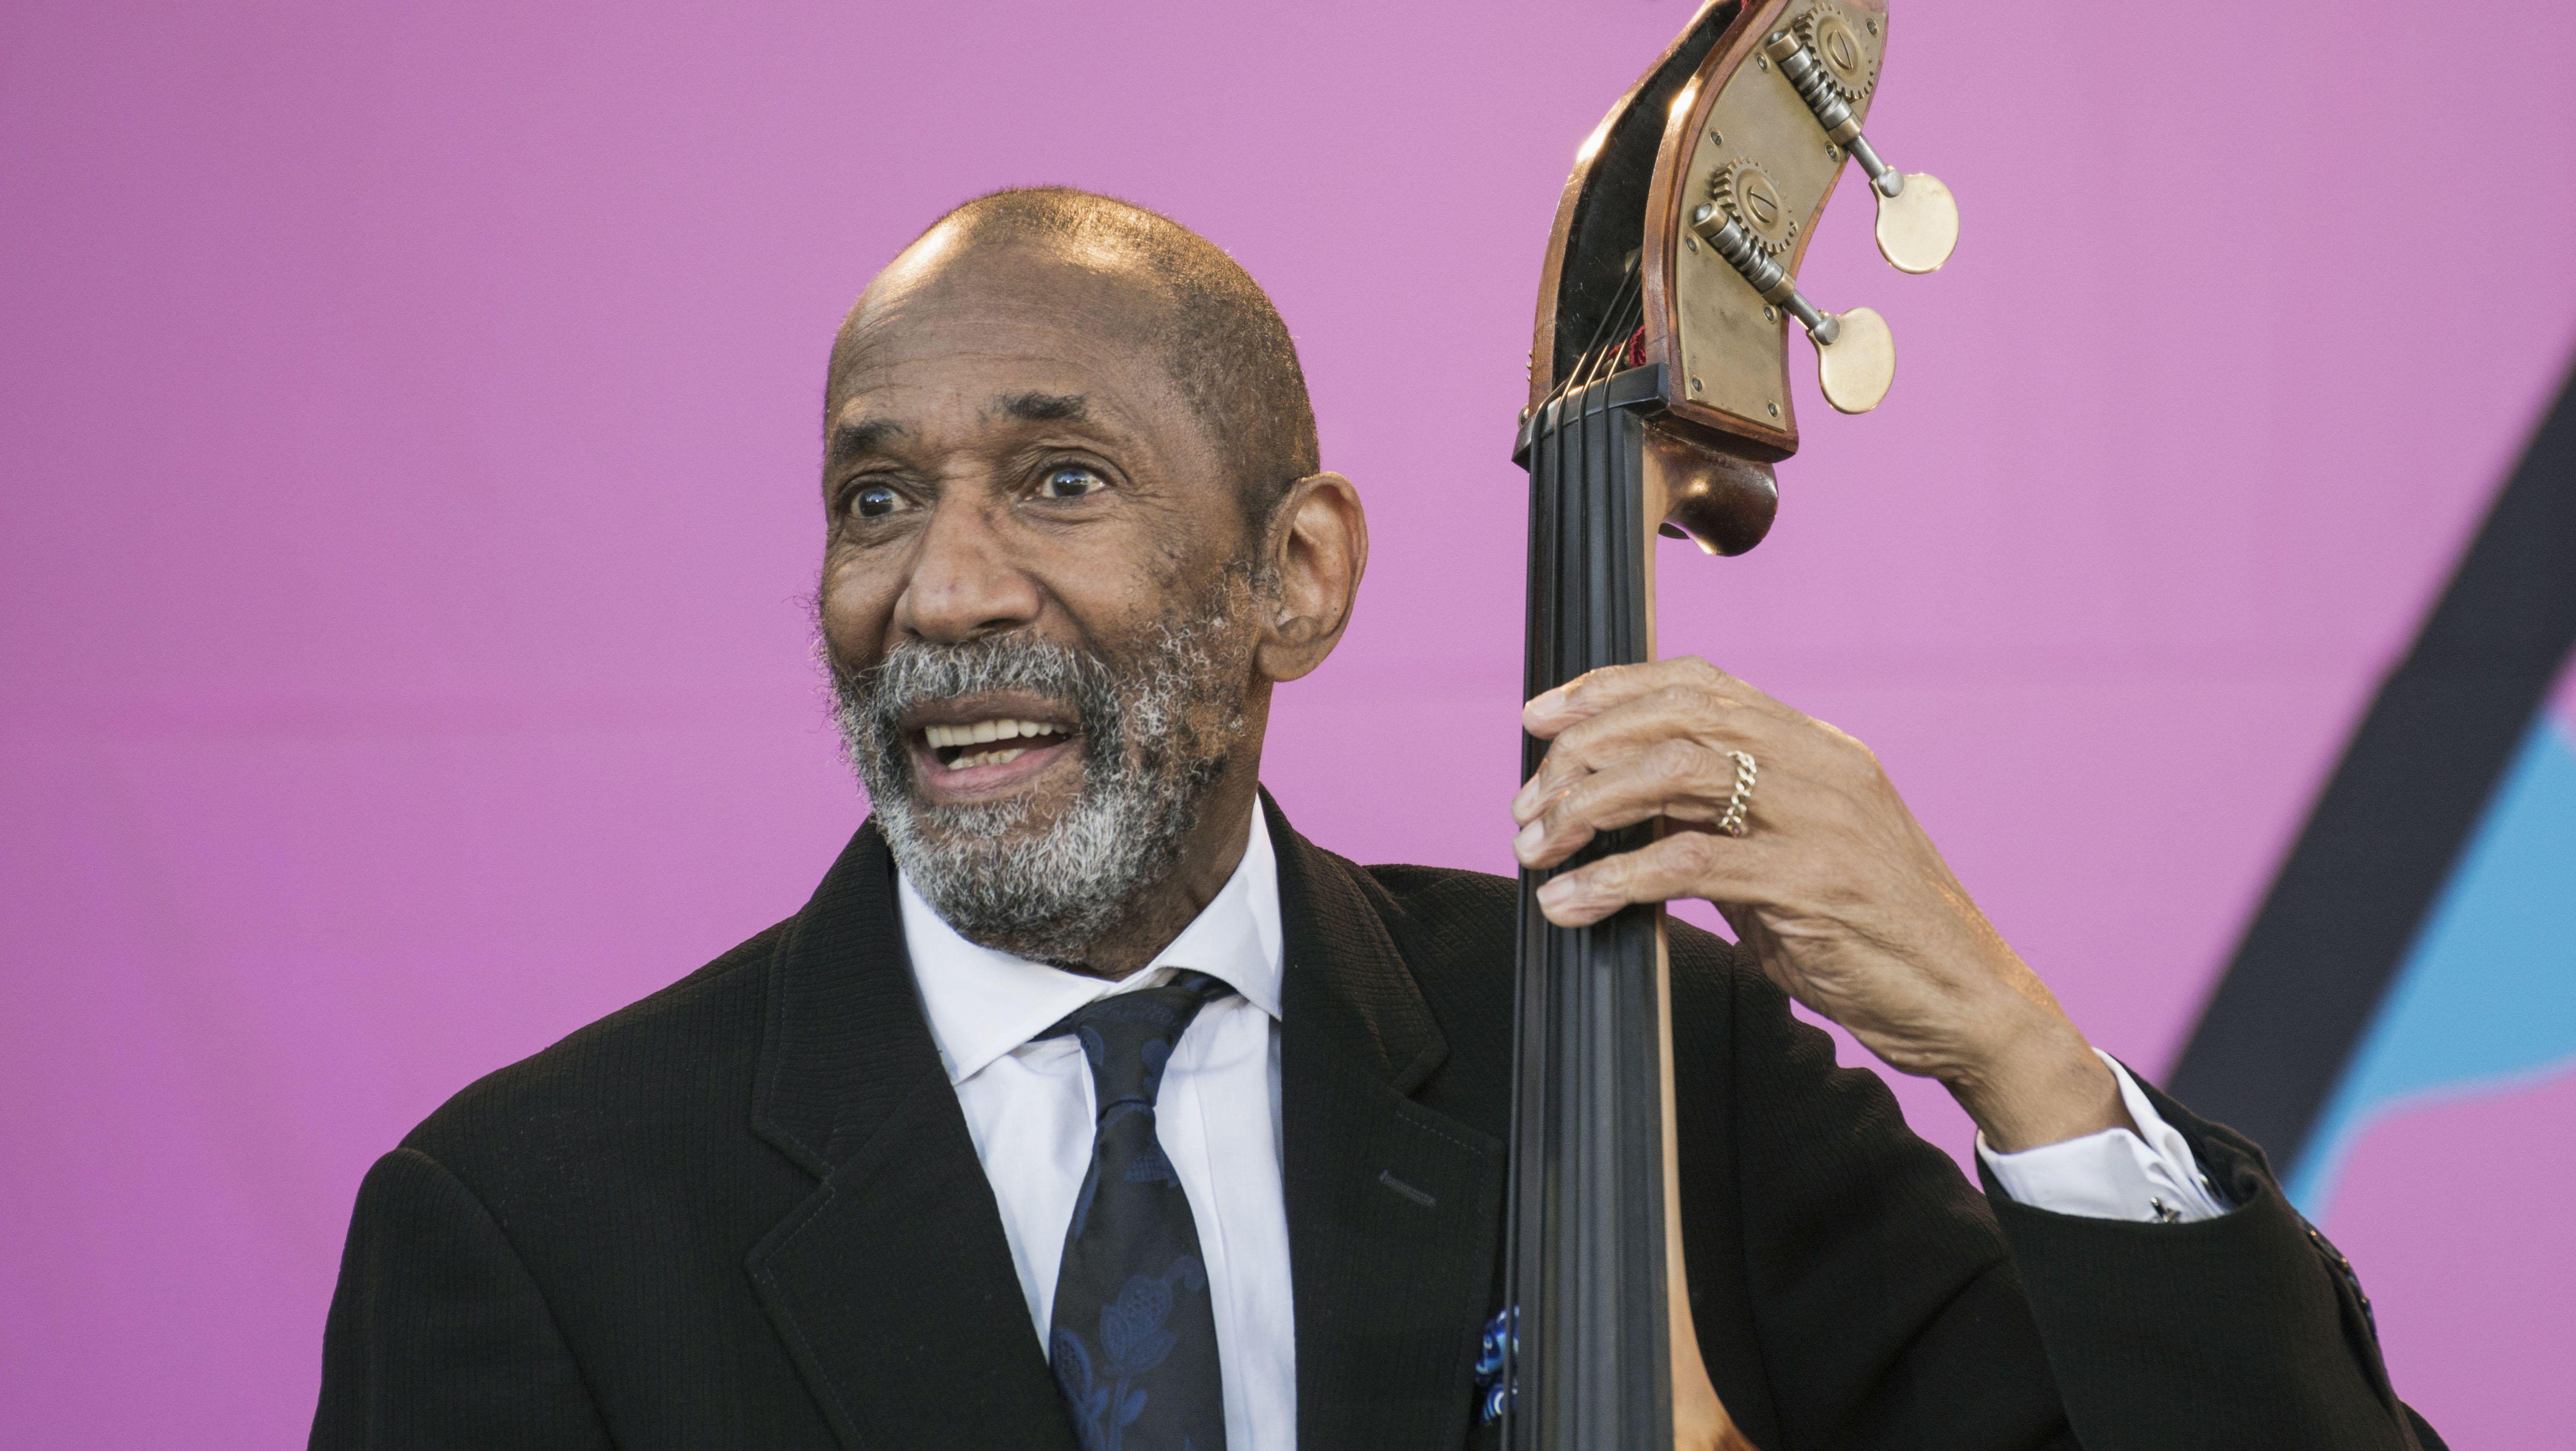 Jazz-Bassist Ron Carter